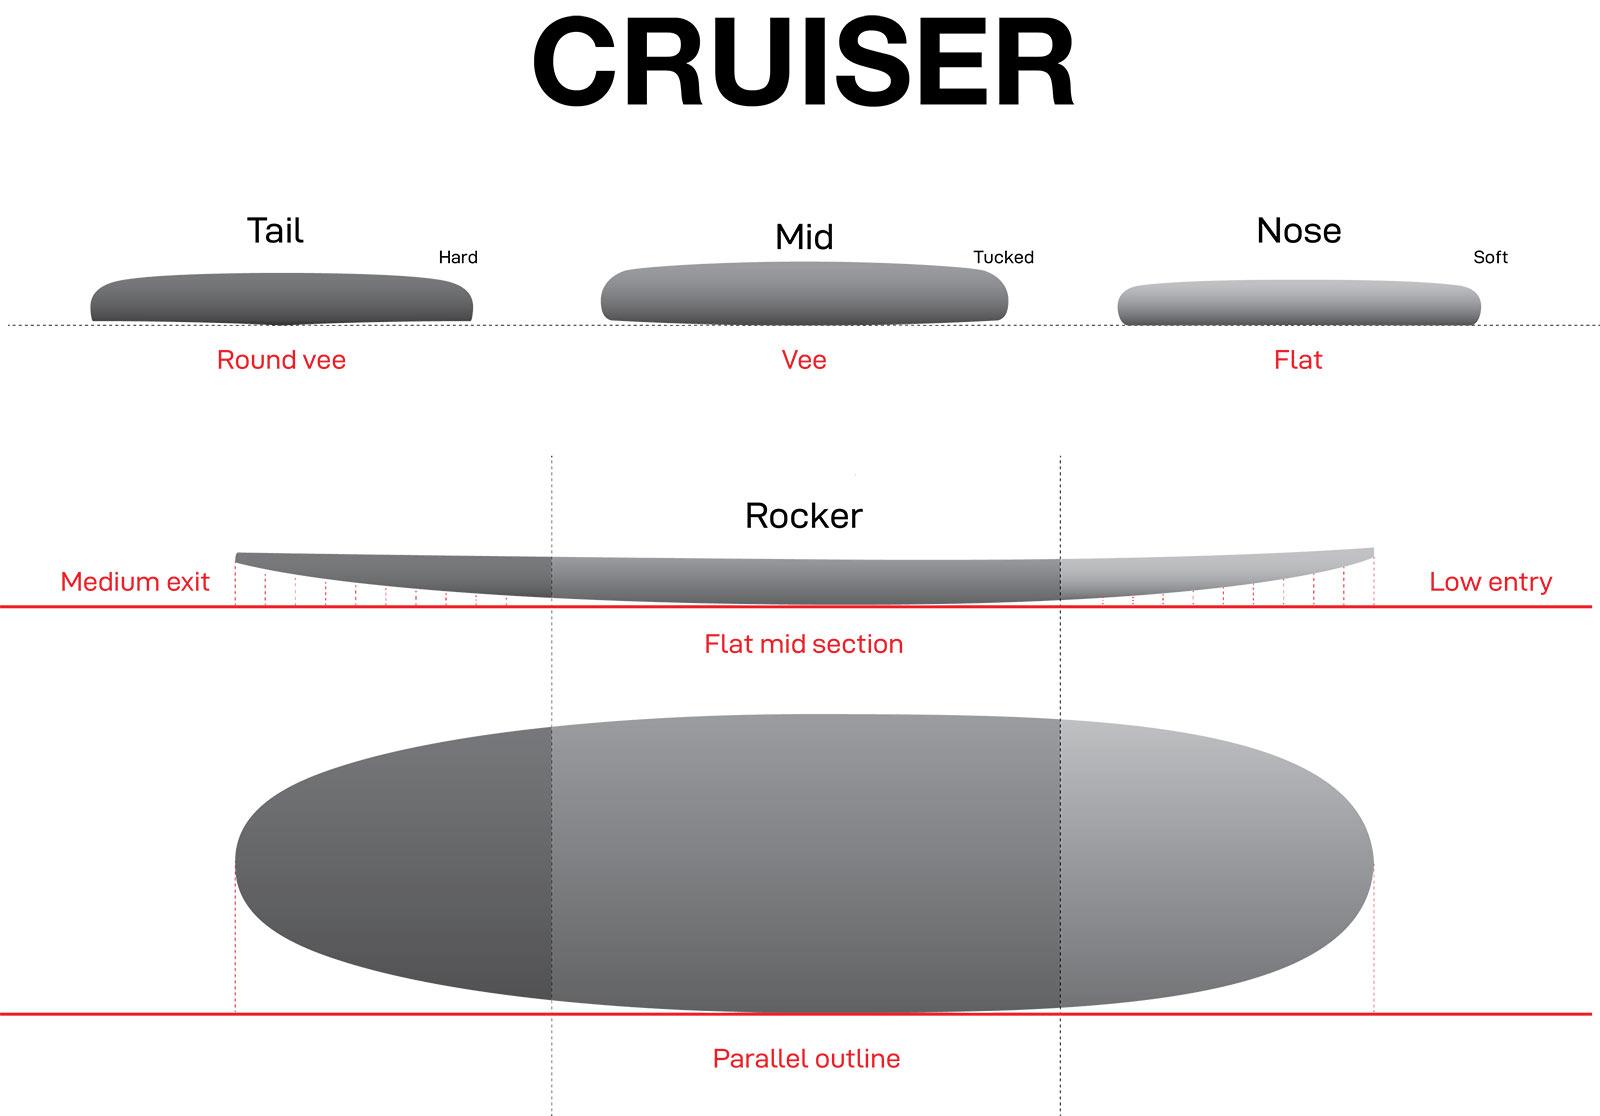 HIT cruiser